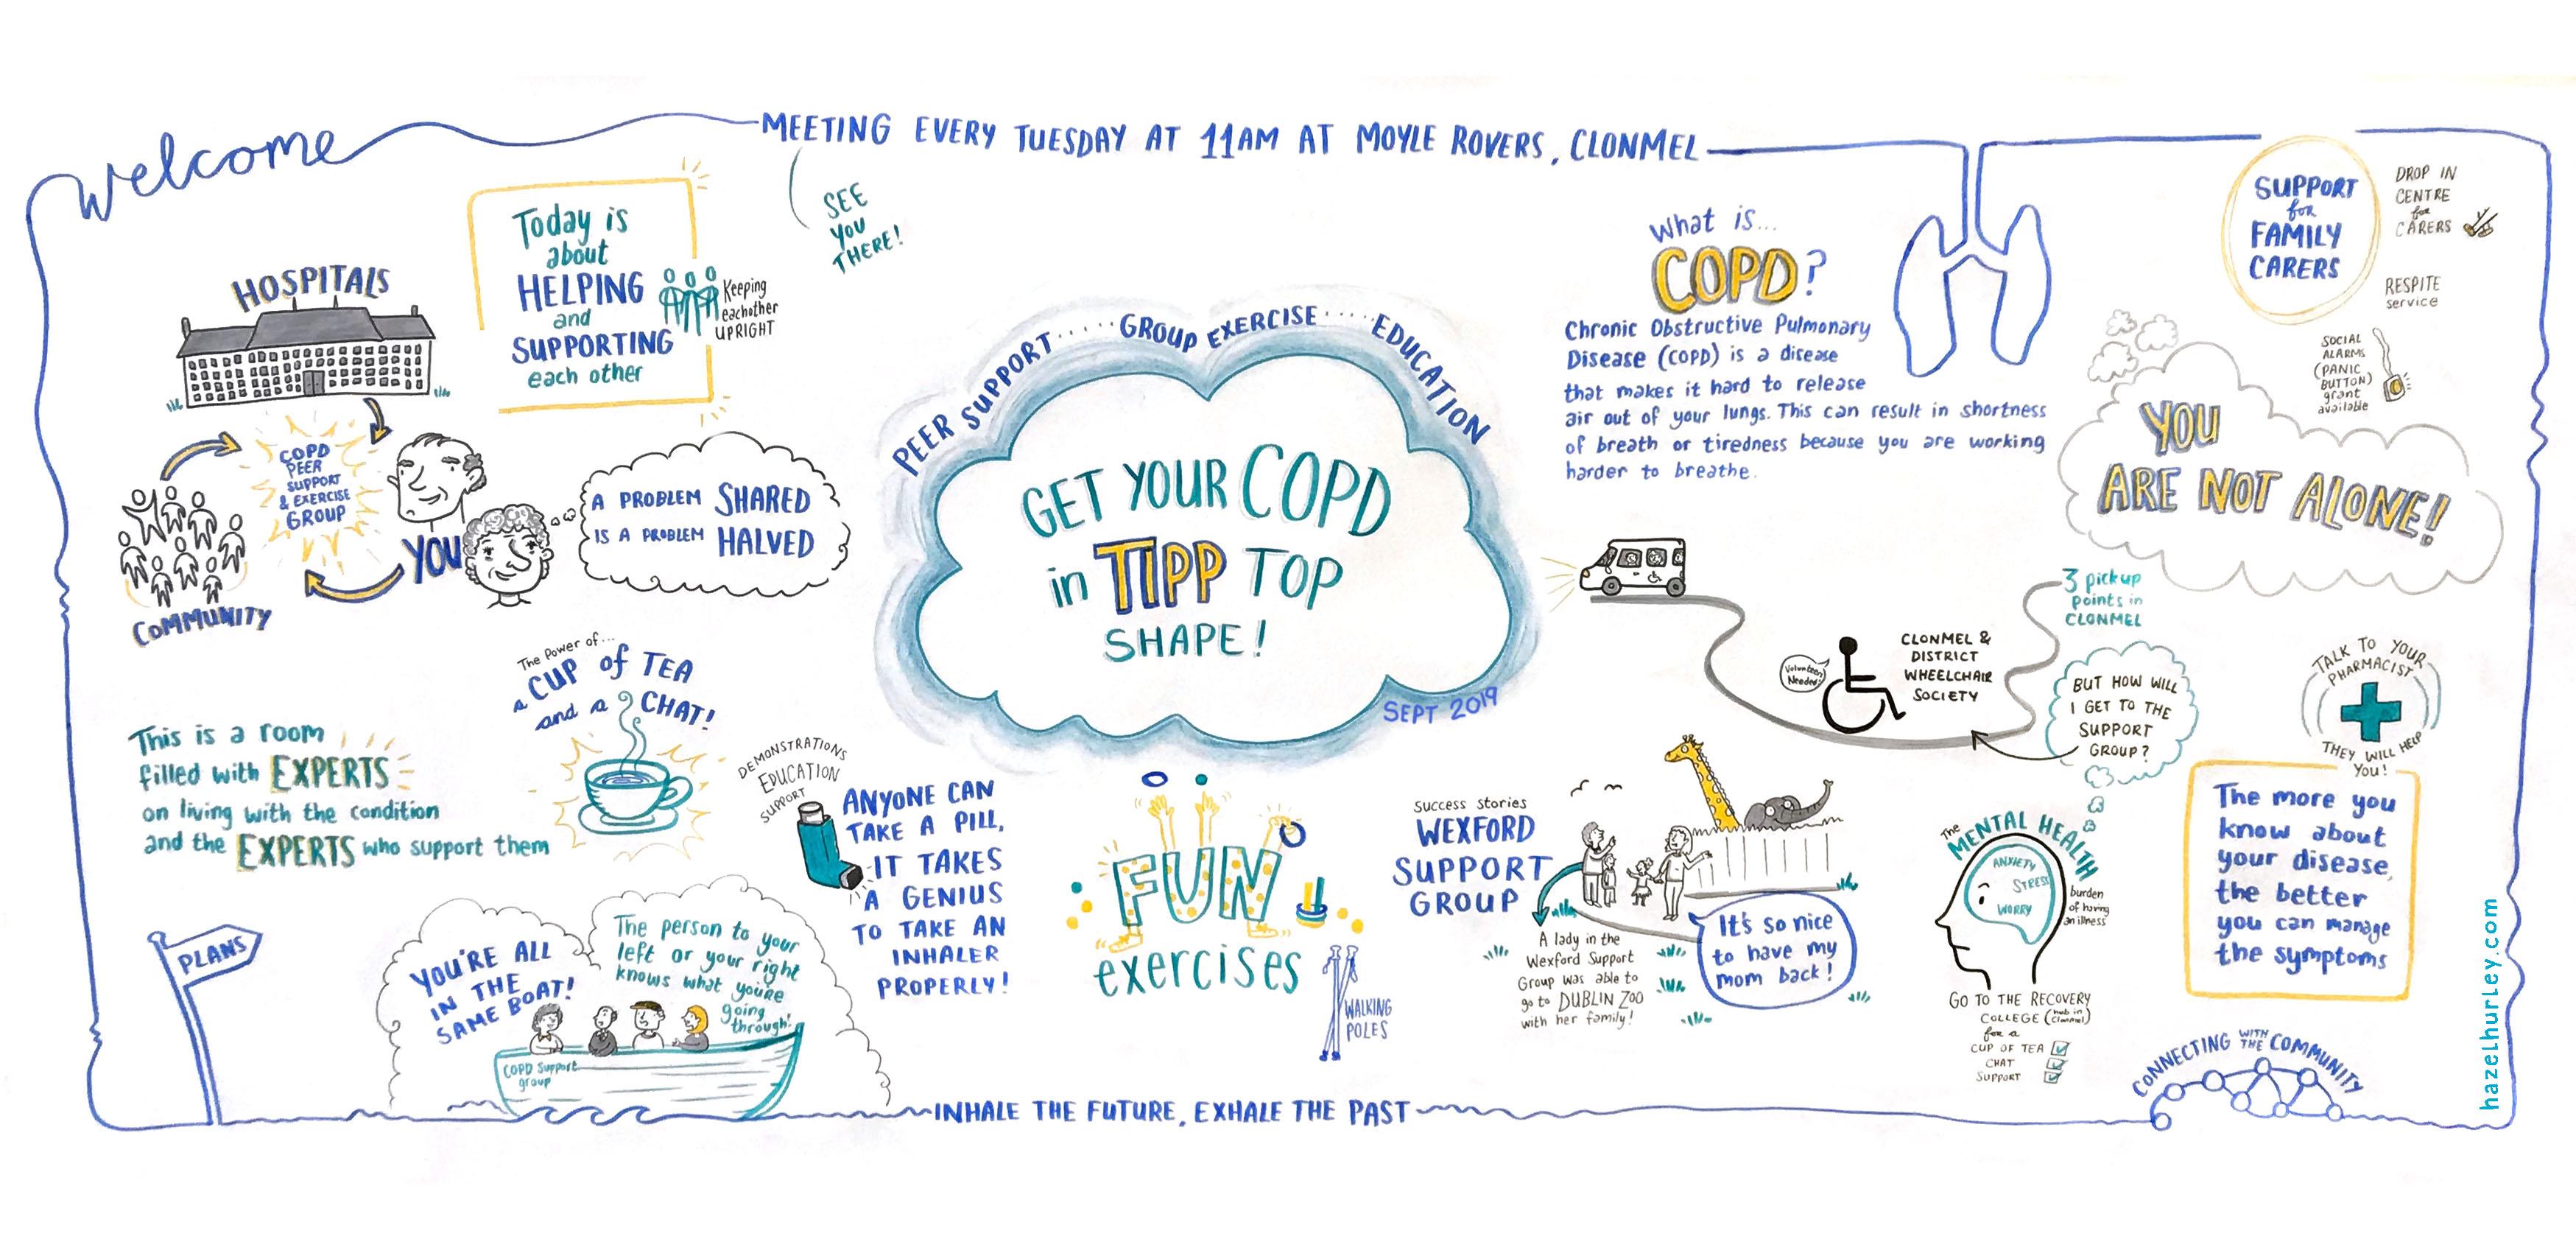 COPD Tipp graphic recording